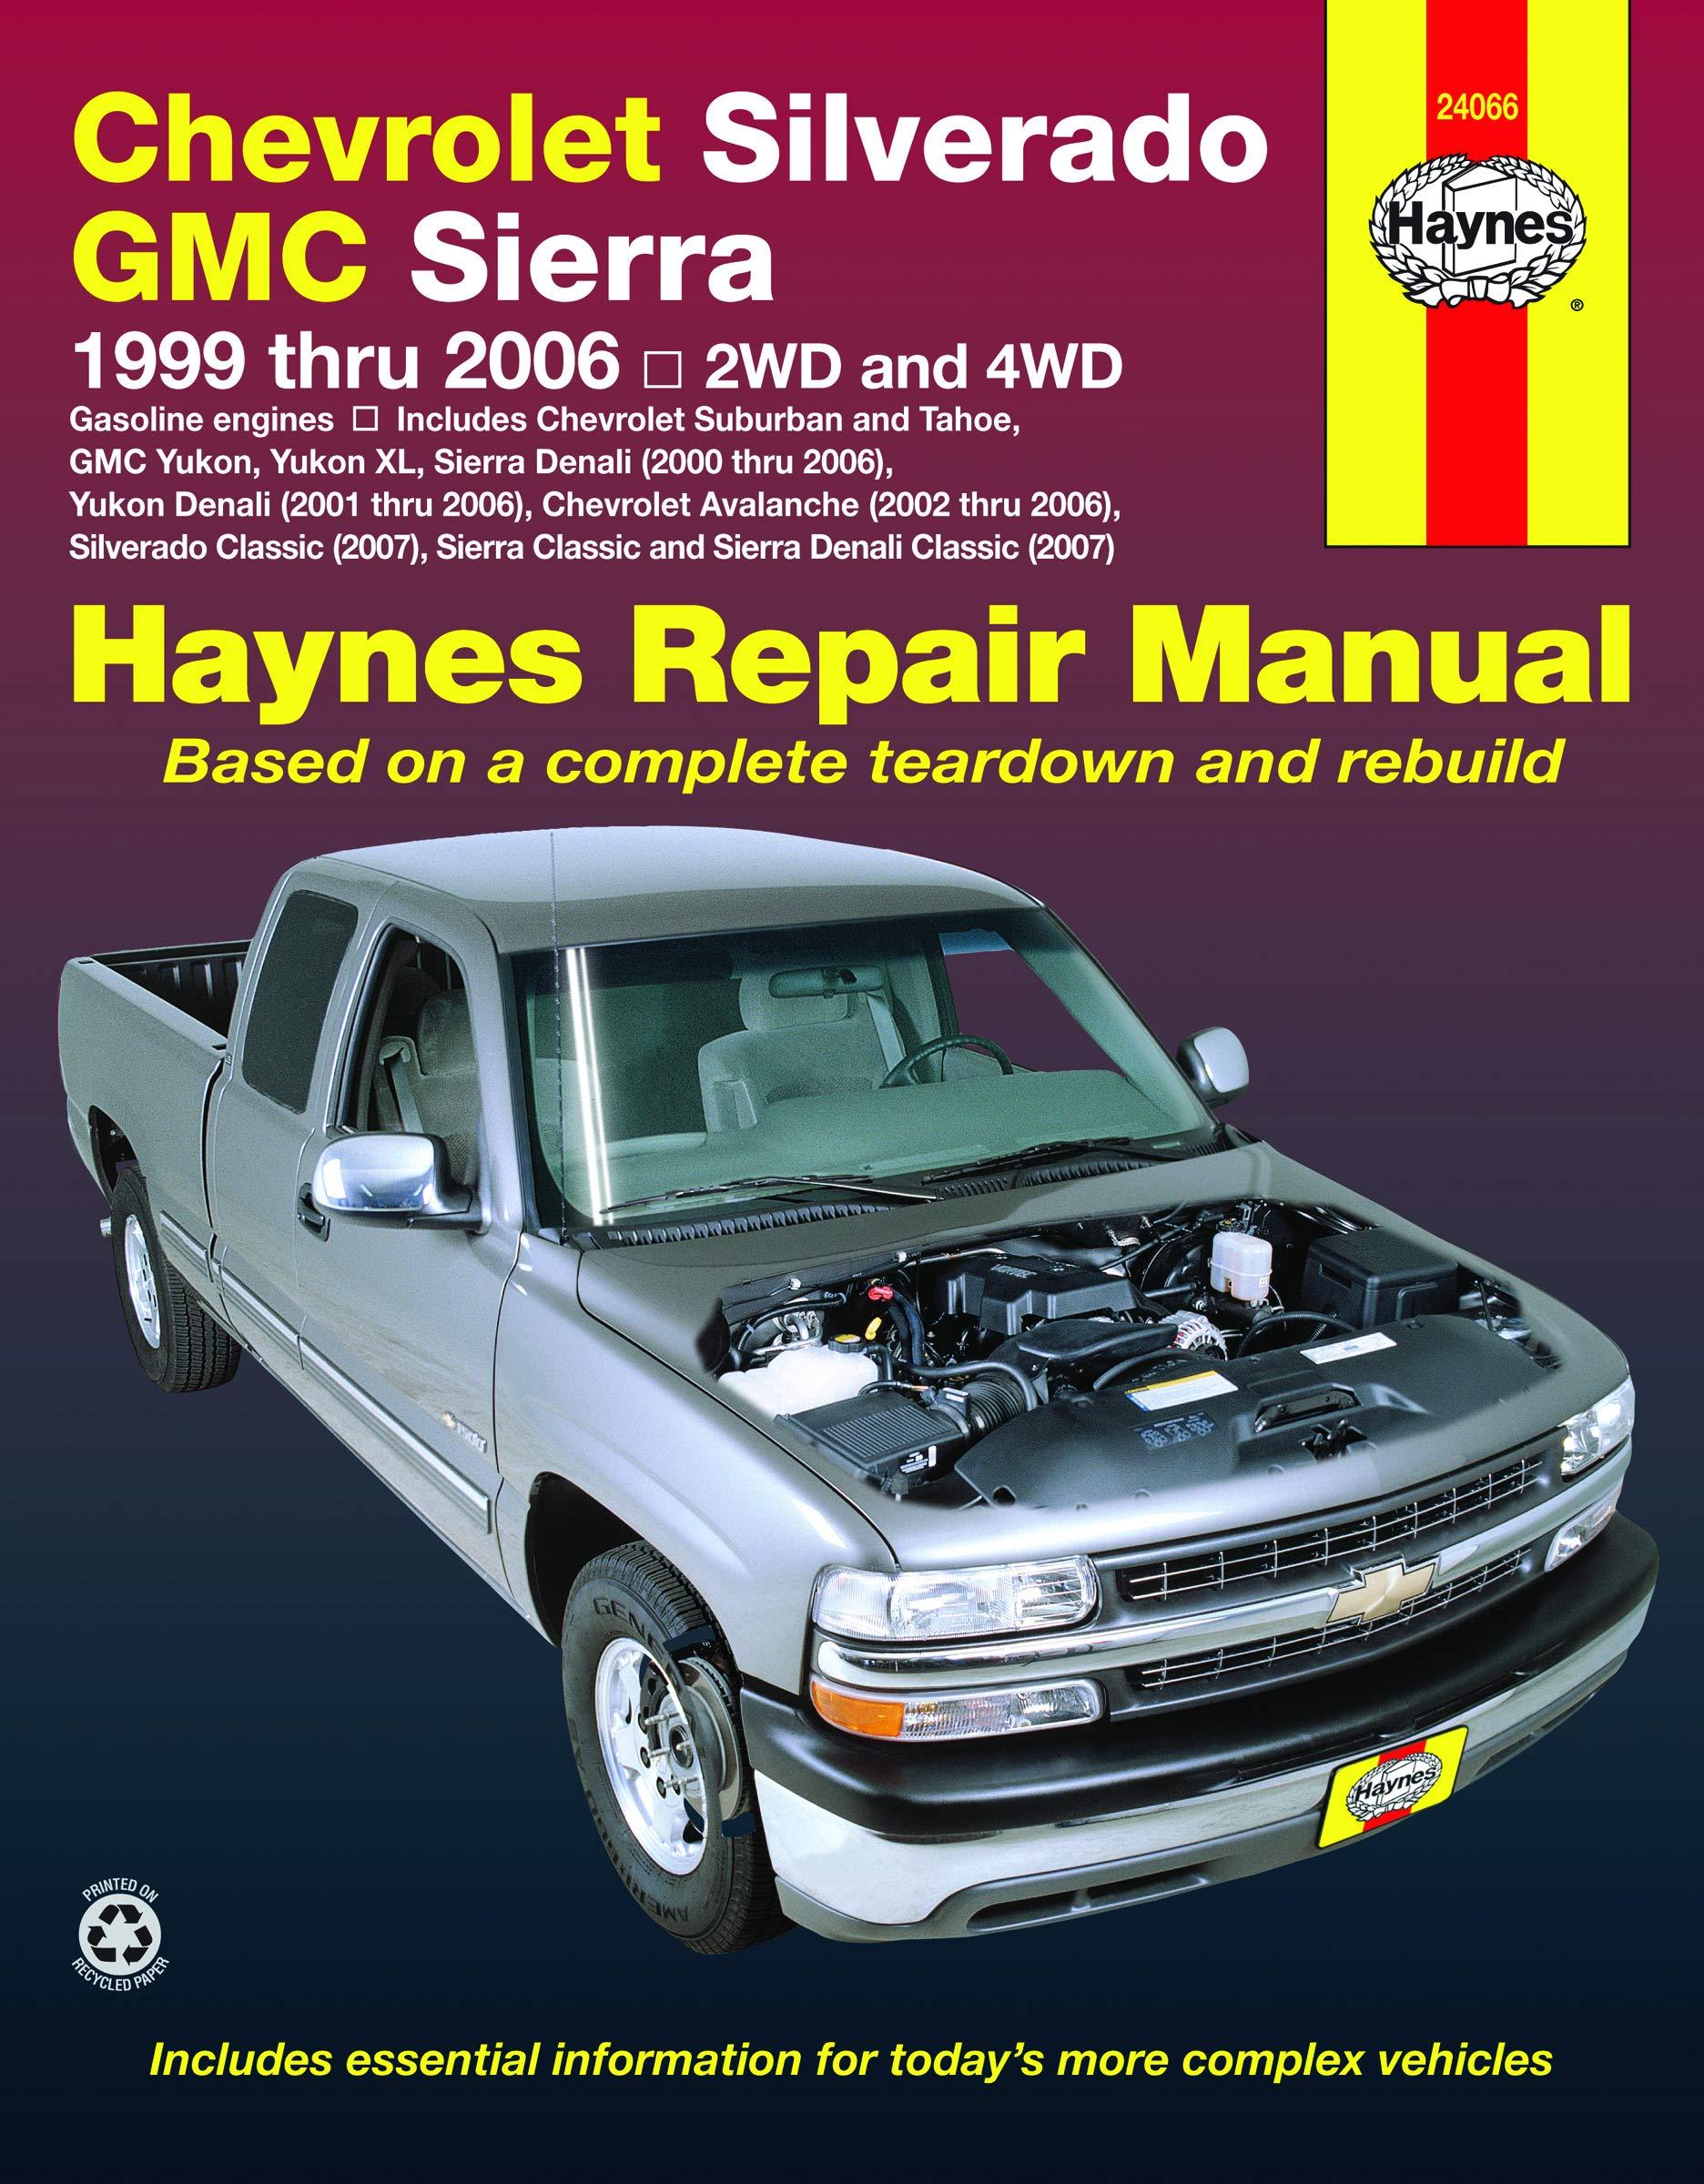 chevrolet silverado & gmc sierra gas pick-ups (99-06) haynes repair manual  (incl: freund, ken: 0038345240669: amazon.com: books  amazon.com